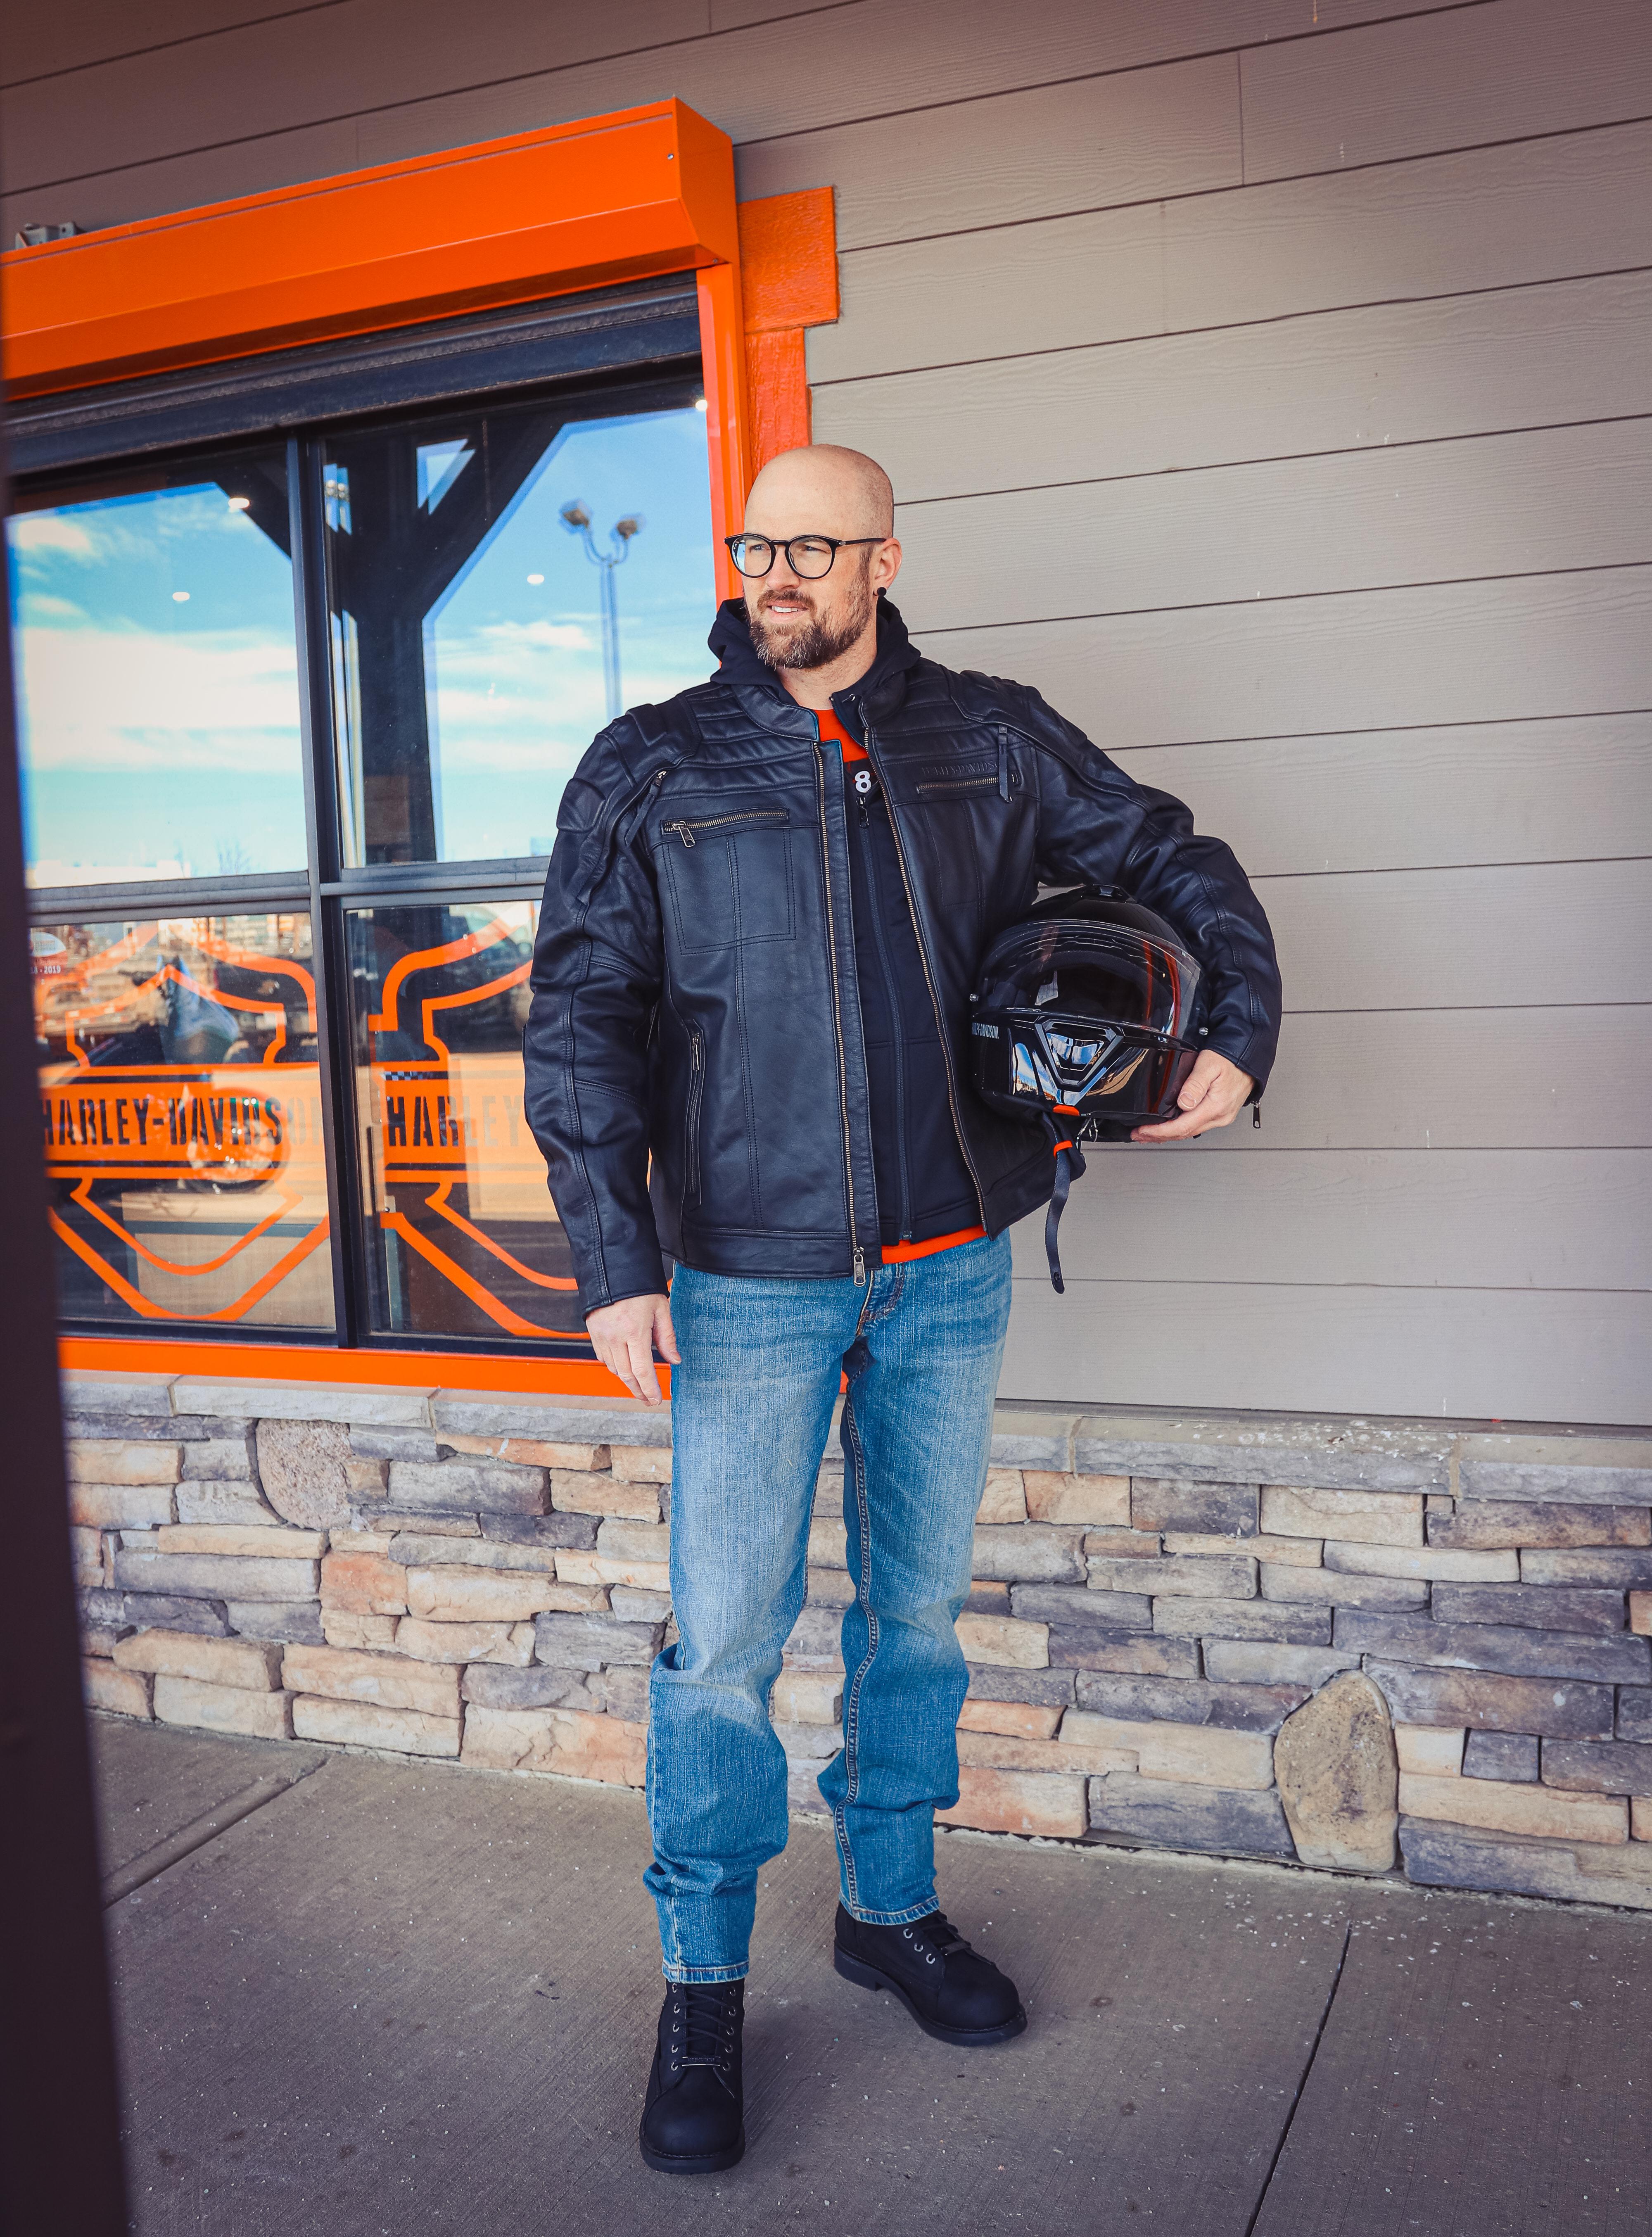 MotorClothes at Gasoline Alley Harley-Davidson